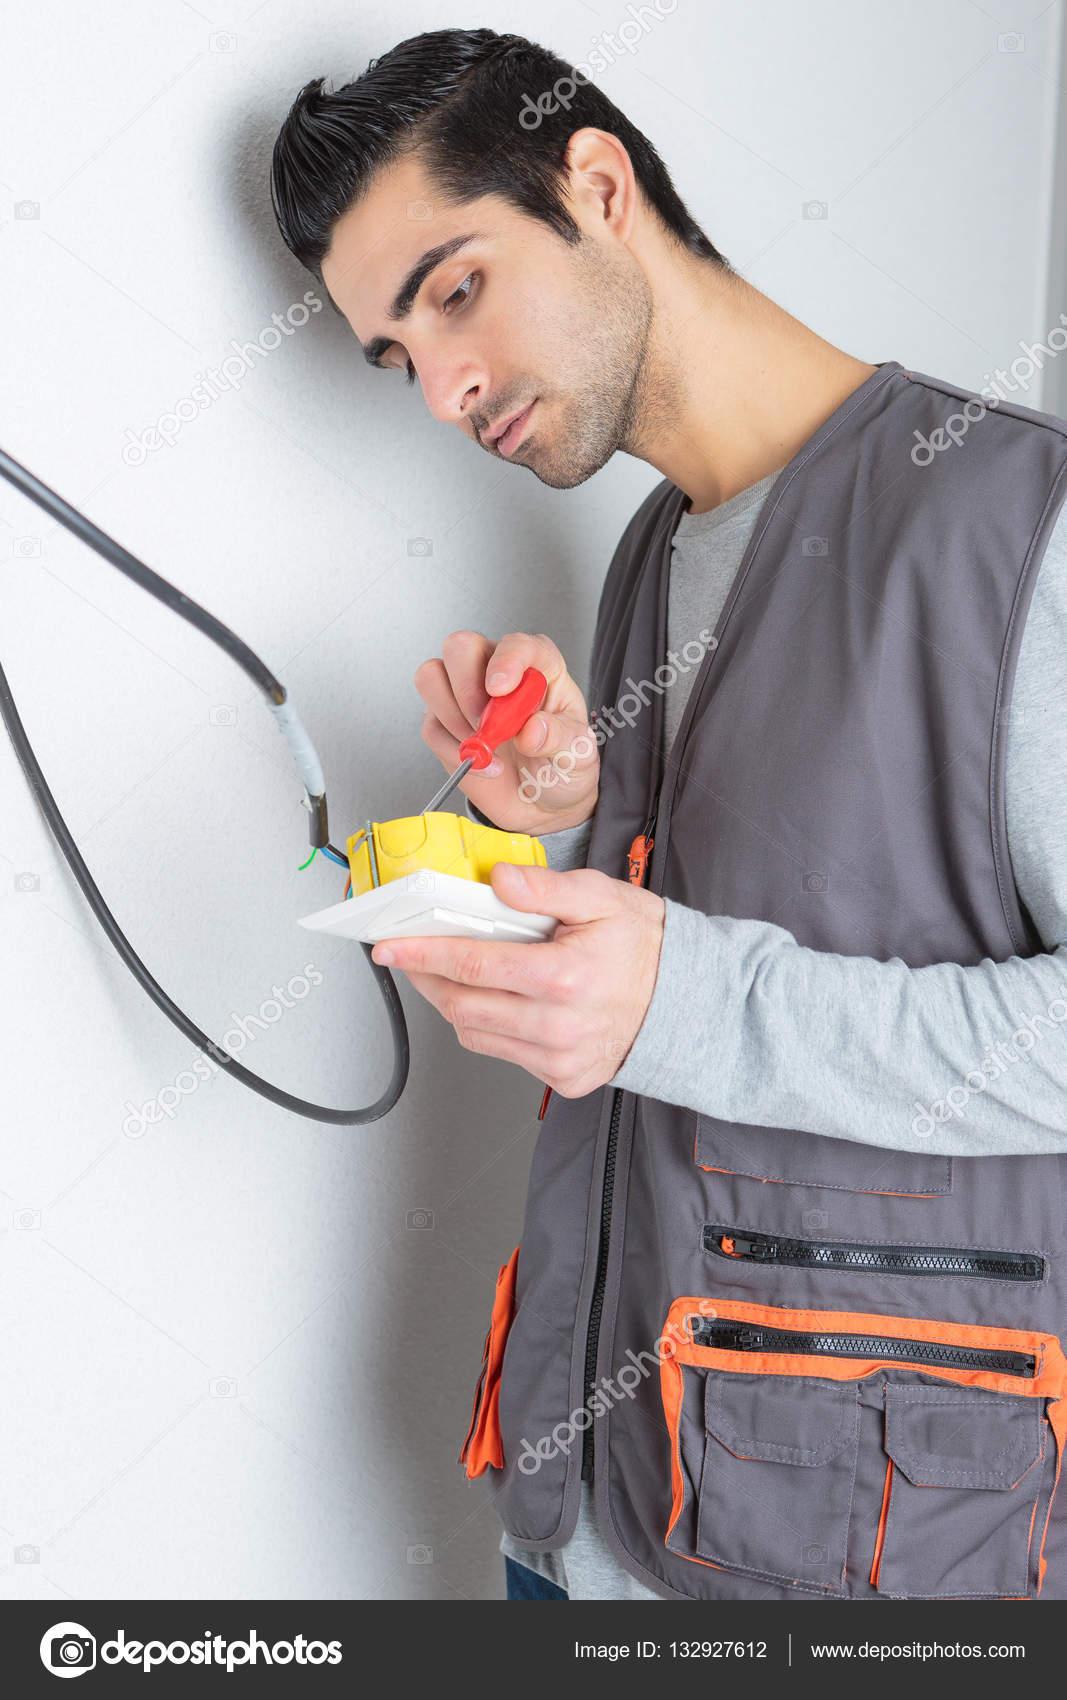 Elektriker Verdrahtung Schalter und Elektriker — Stockfoto ...